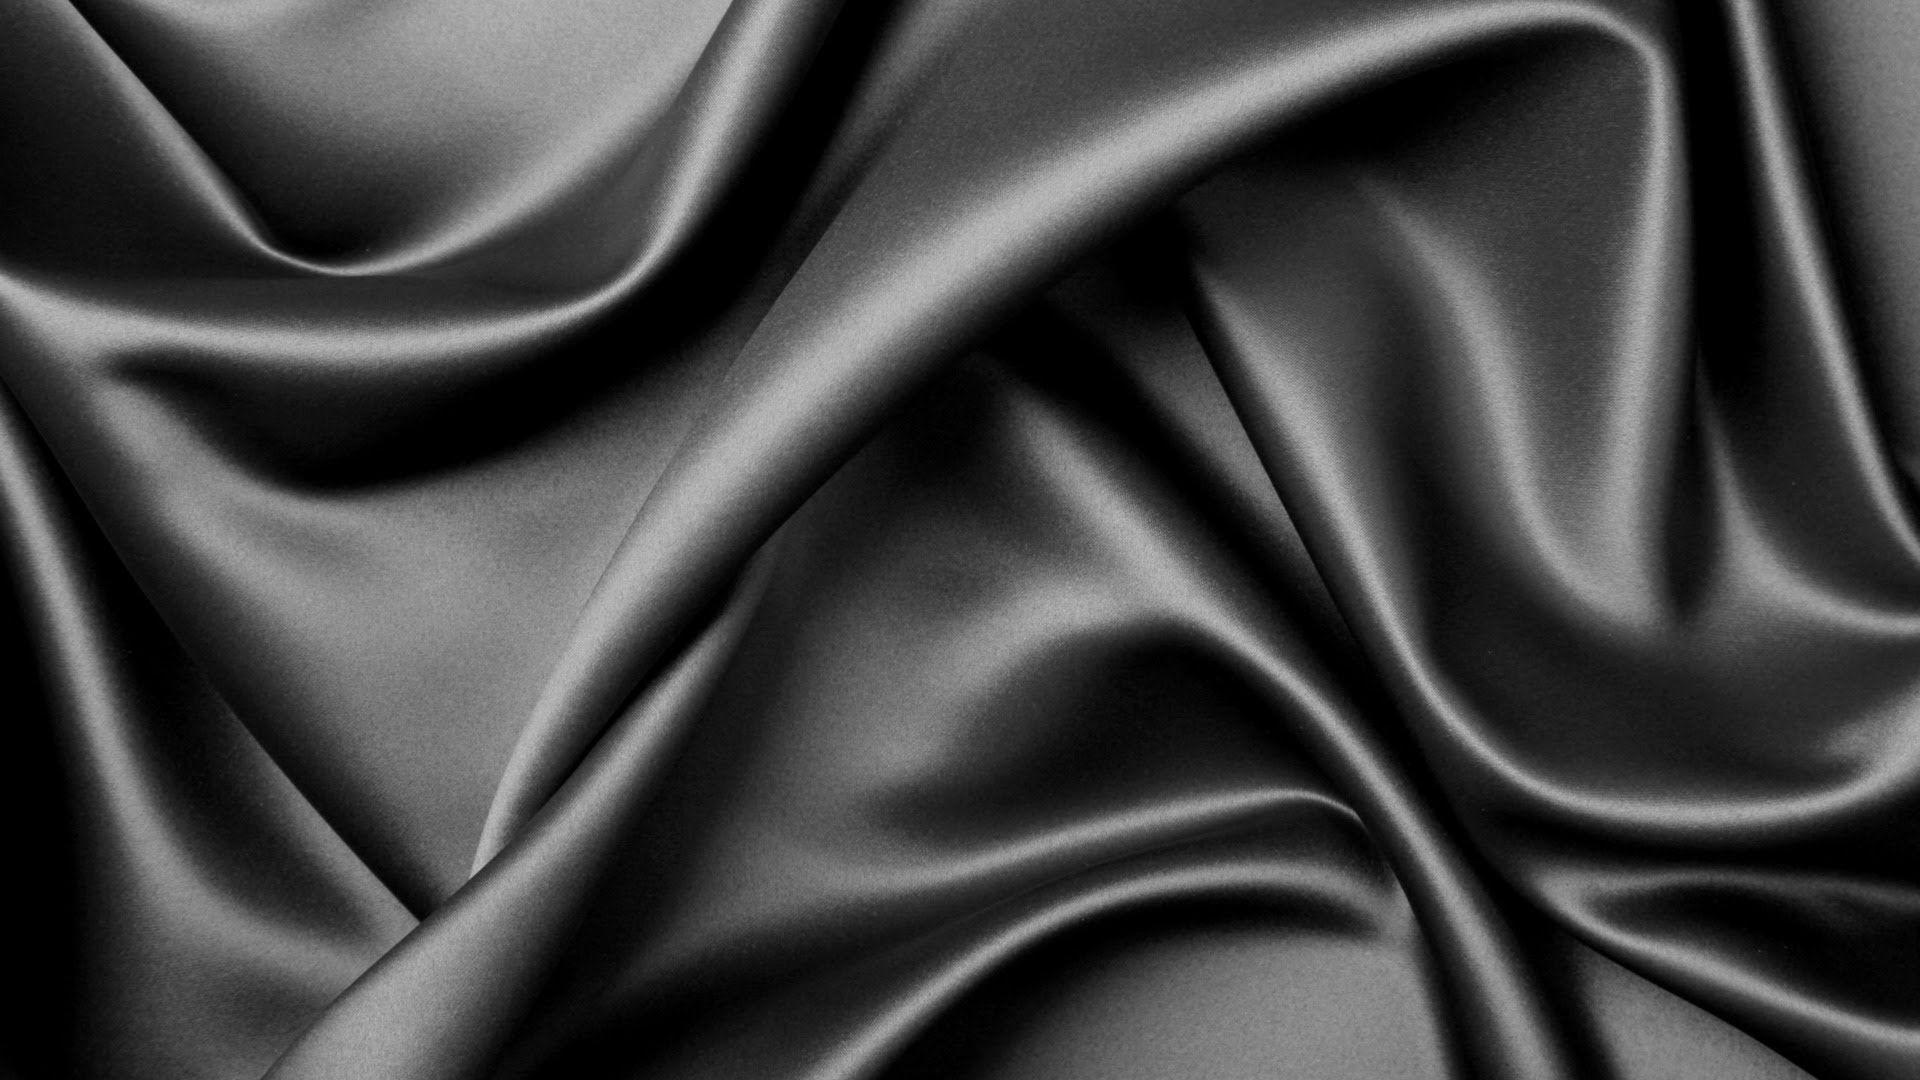 CLOTH Tutorial in Cinema 4D | Cinema 4D | Silk wallpaper